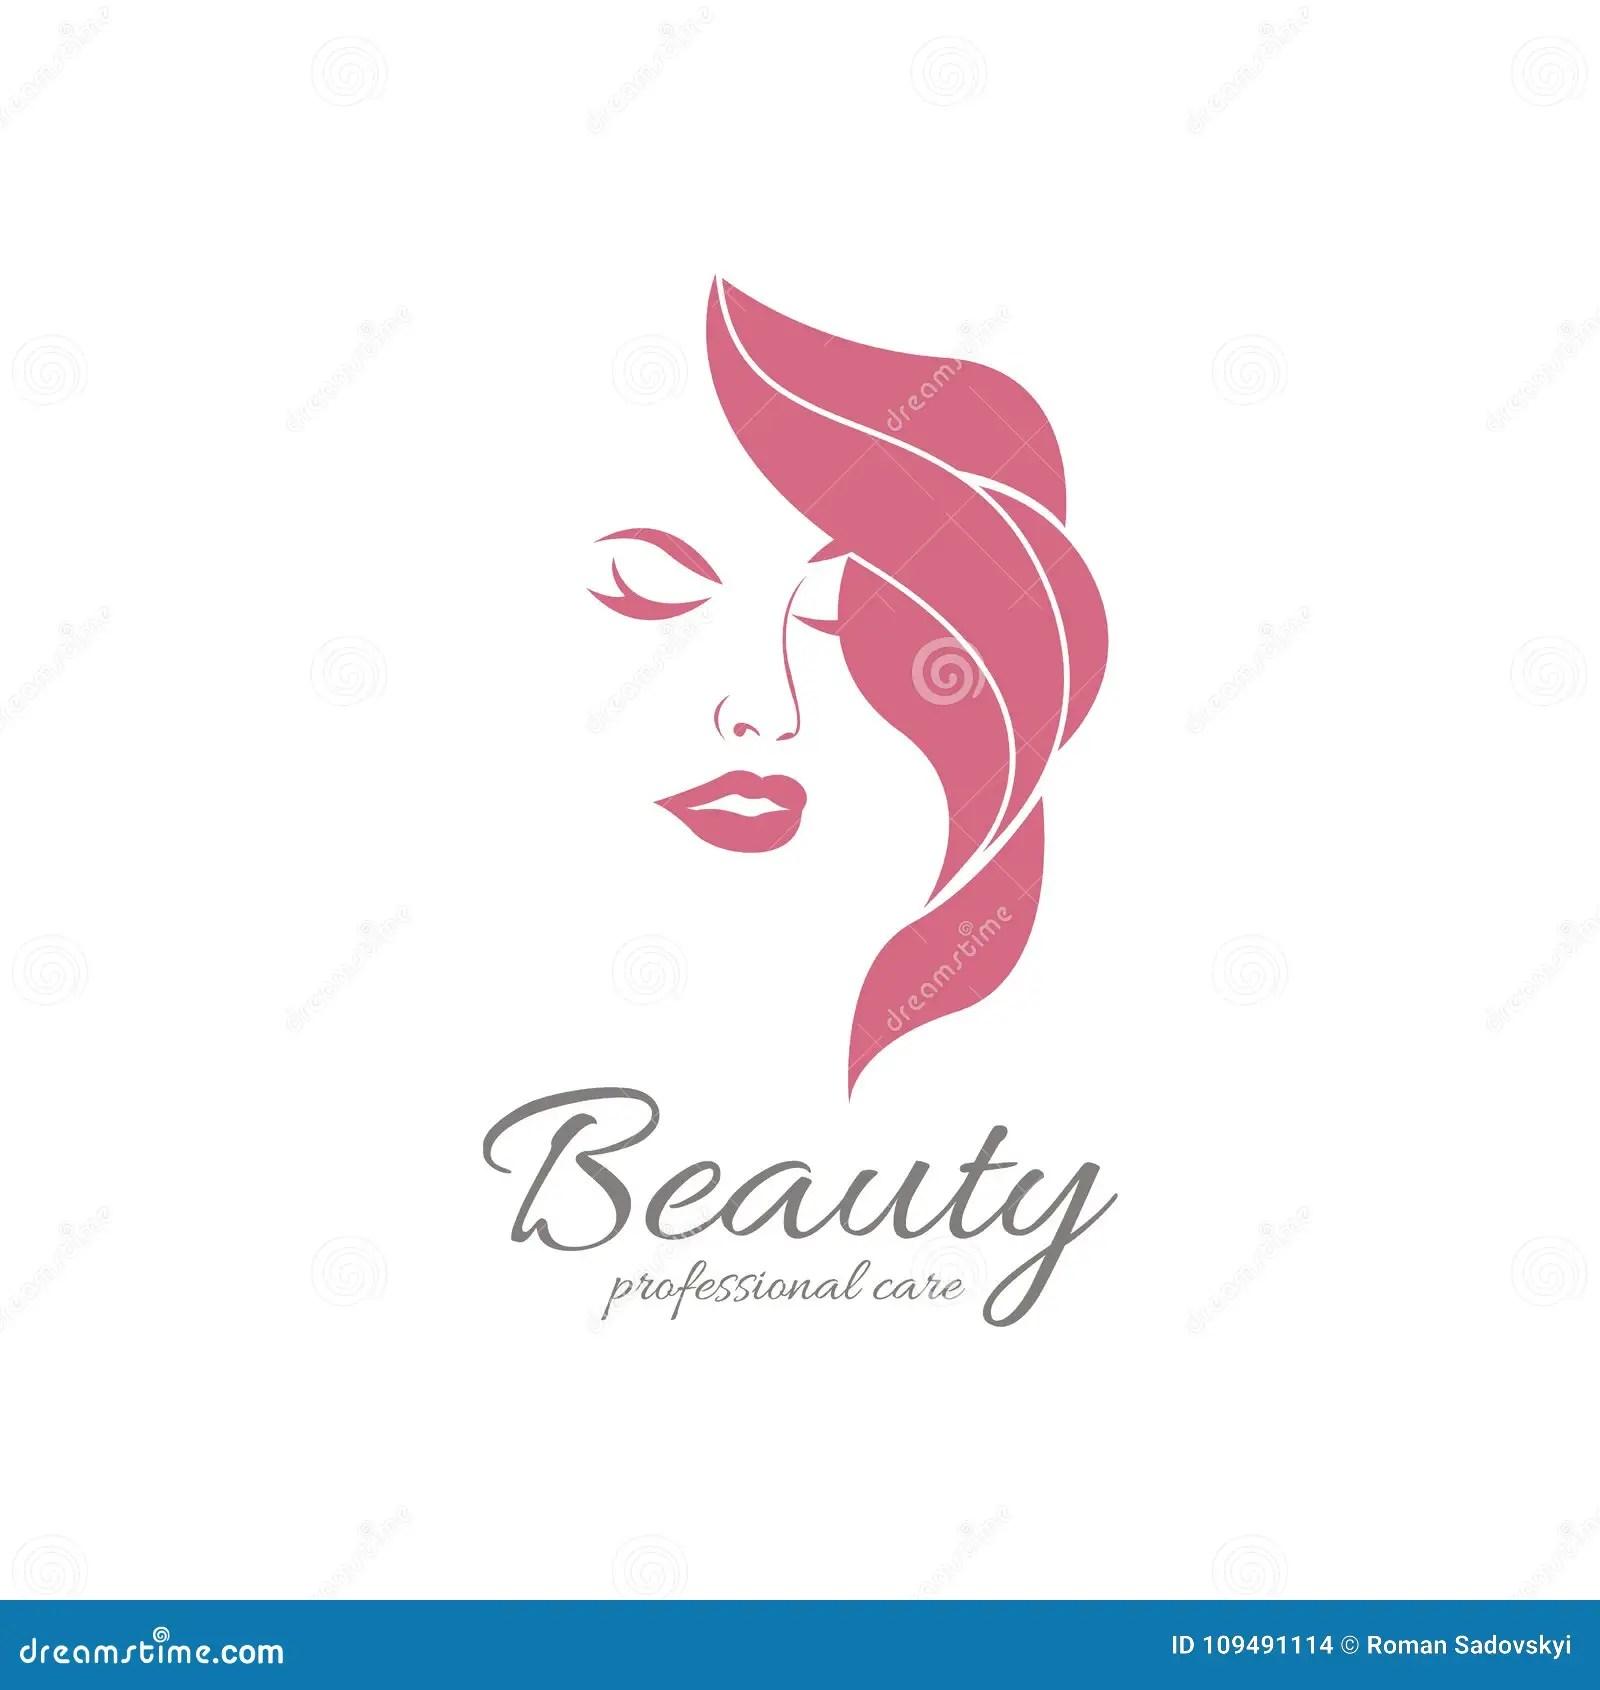 beauty logo vector logo